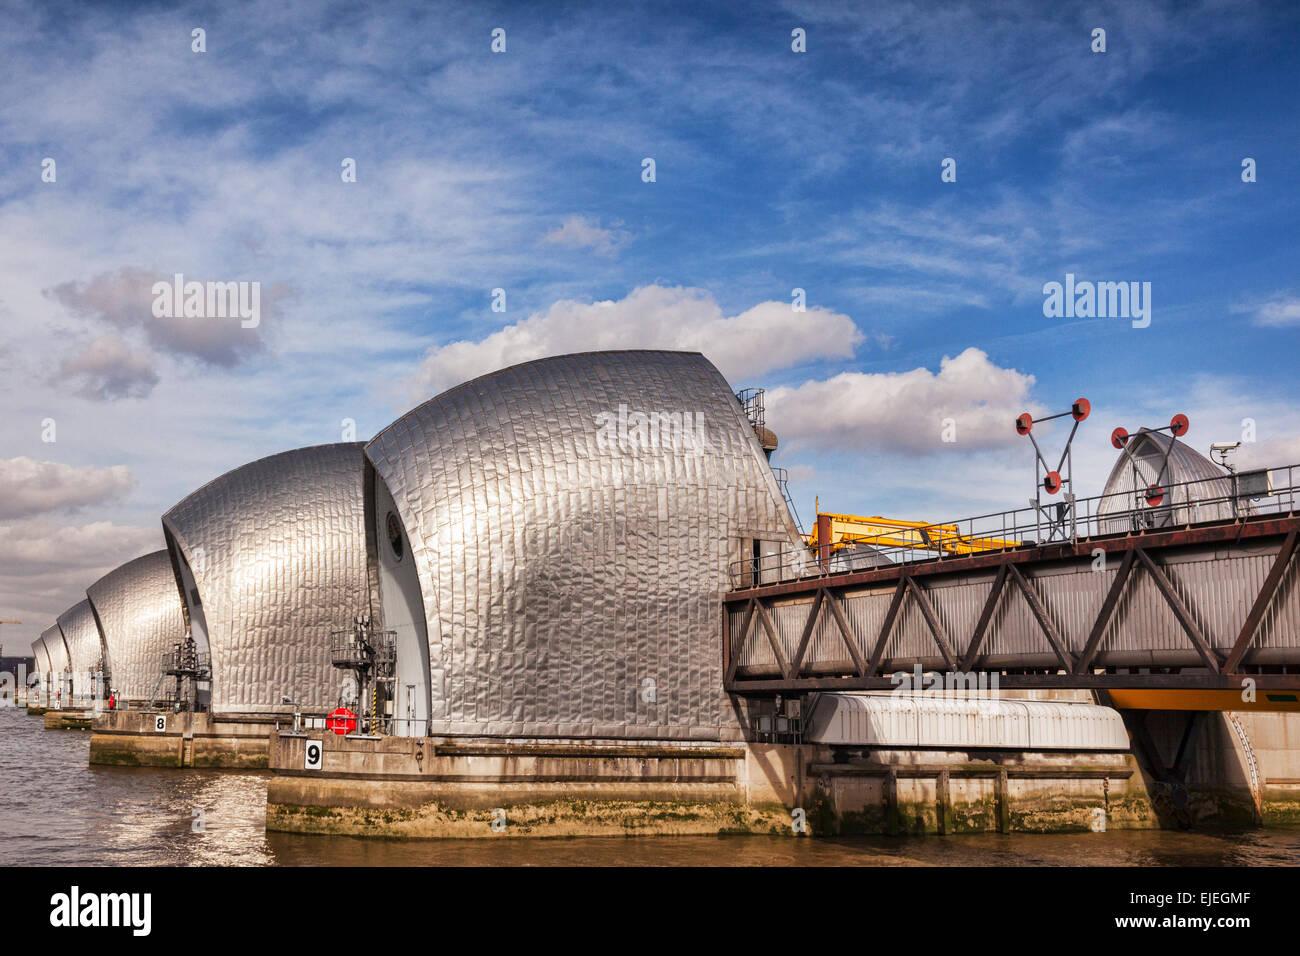 Thames Barrier, Londra, Inghilterra. Immagini Stock